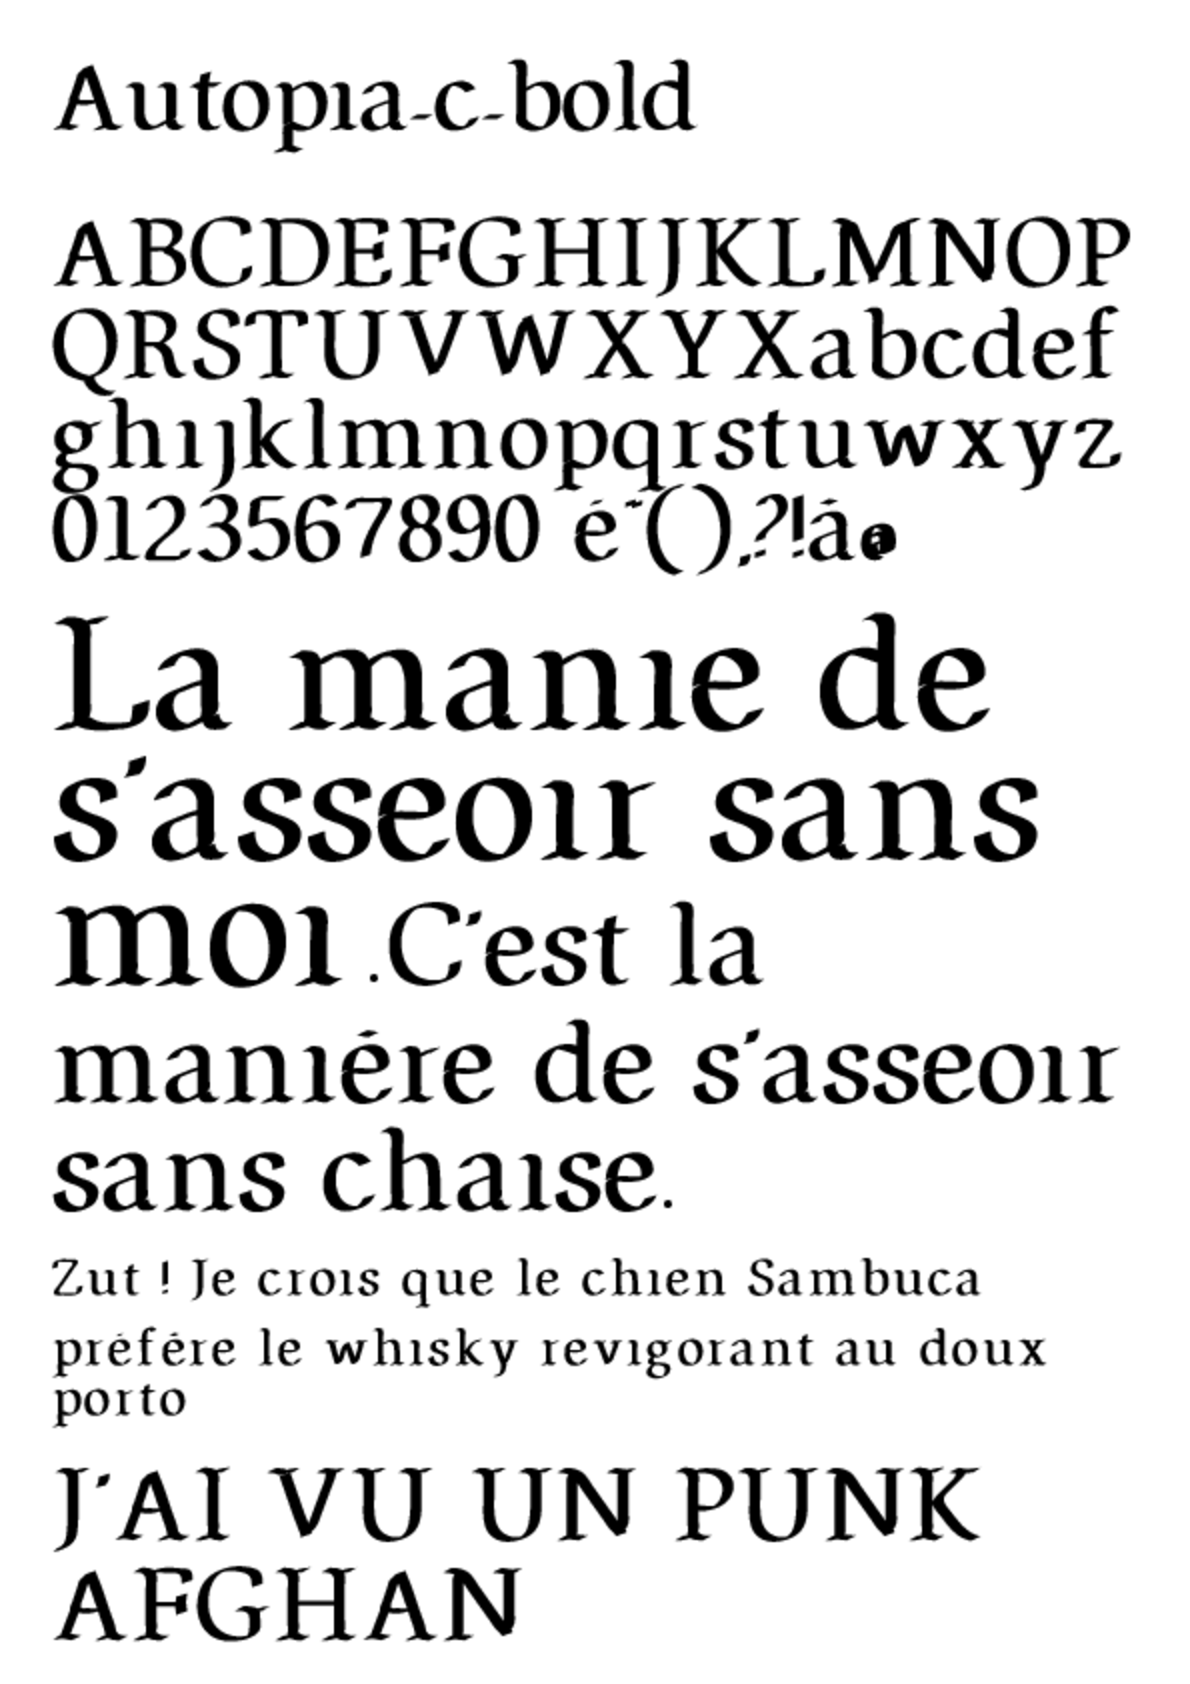 Autopia-presenta/specimen-autopia-c-bold.png